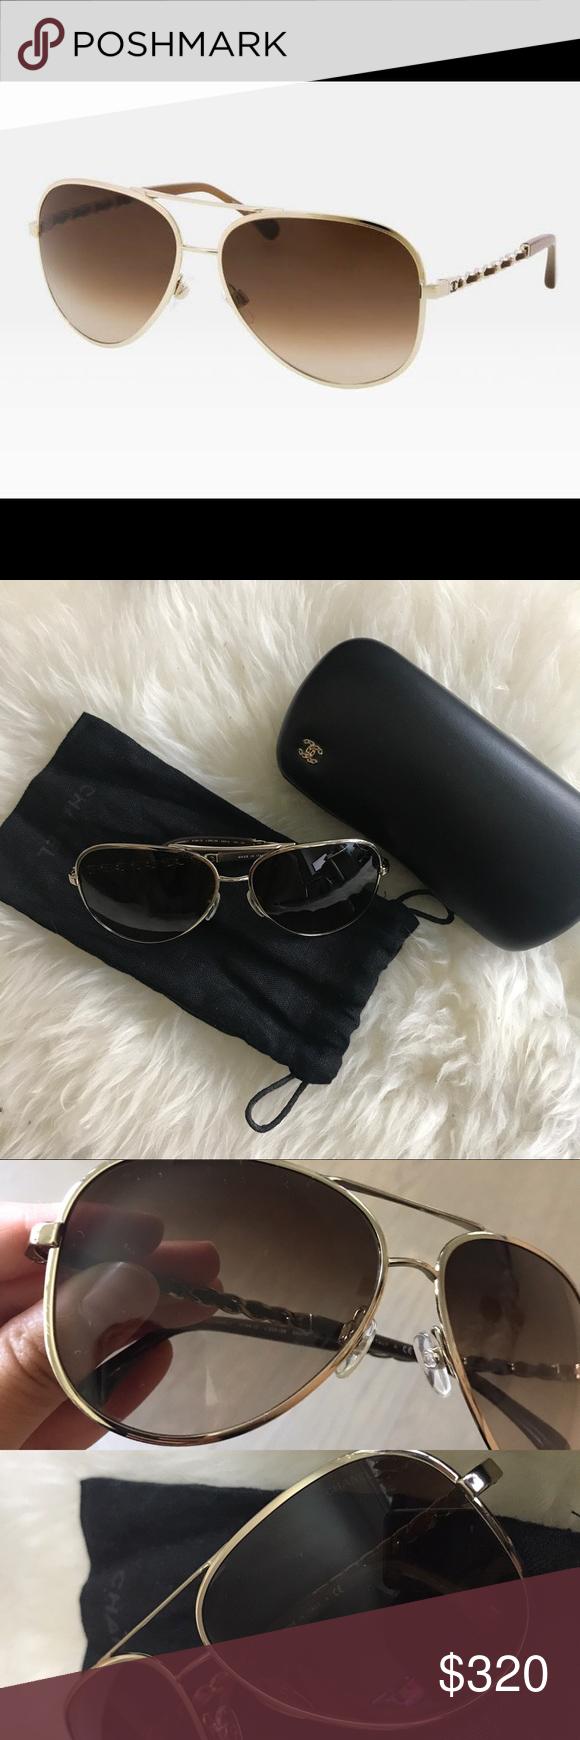 8b4806ae0ce6 Chanel chain aviator sunglasses brown gold 4194Q 100% authentic Chanel  classic chain aviator sunglasses!